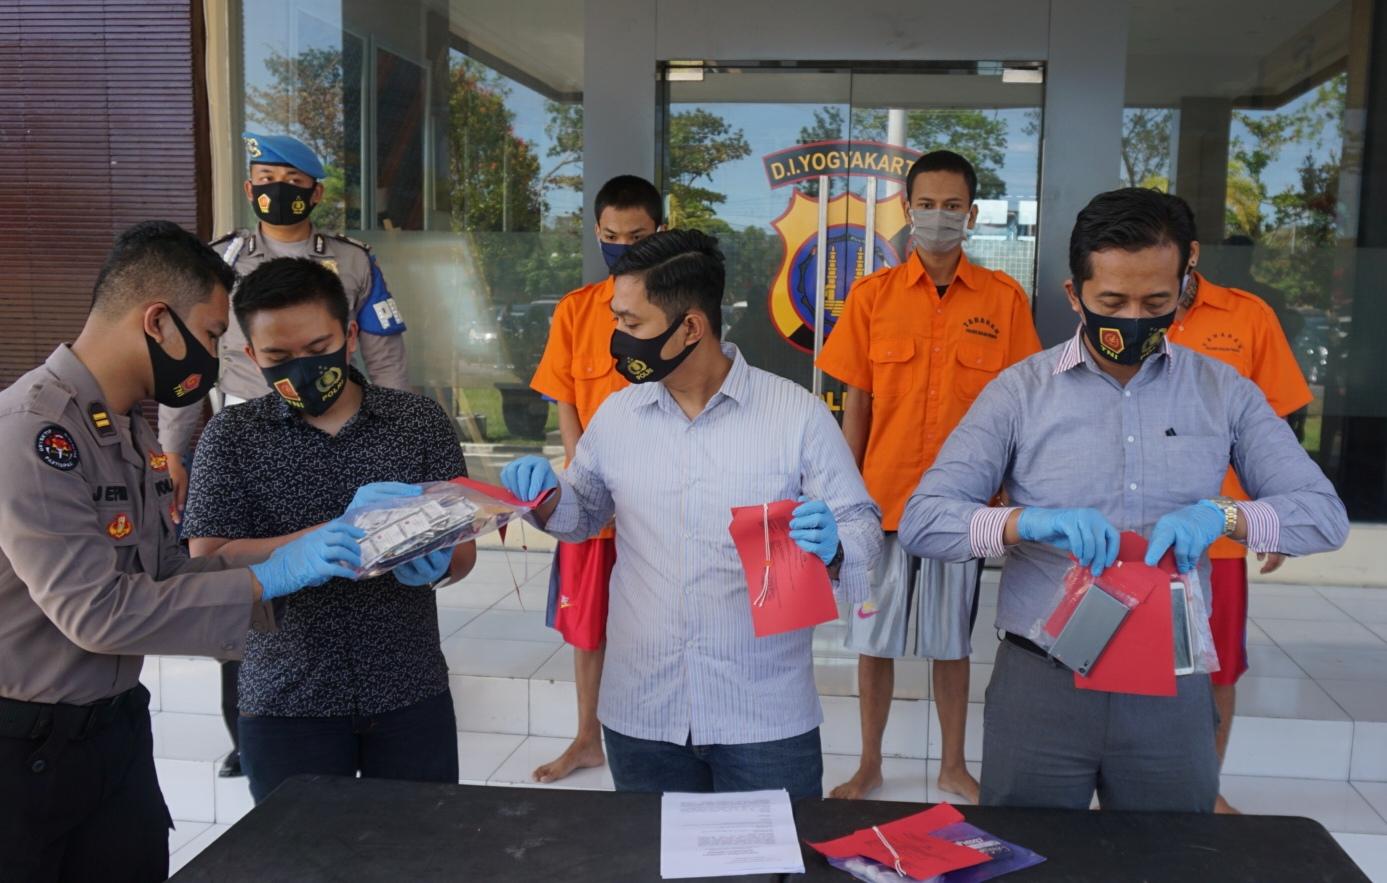 Photo of Dalam Sebulan, Empat Kasus Psikotropika Diungkap di Kulon Progo